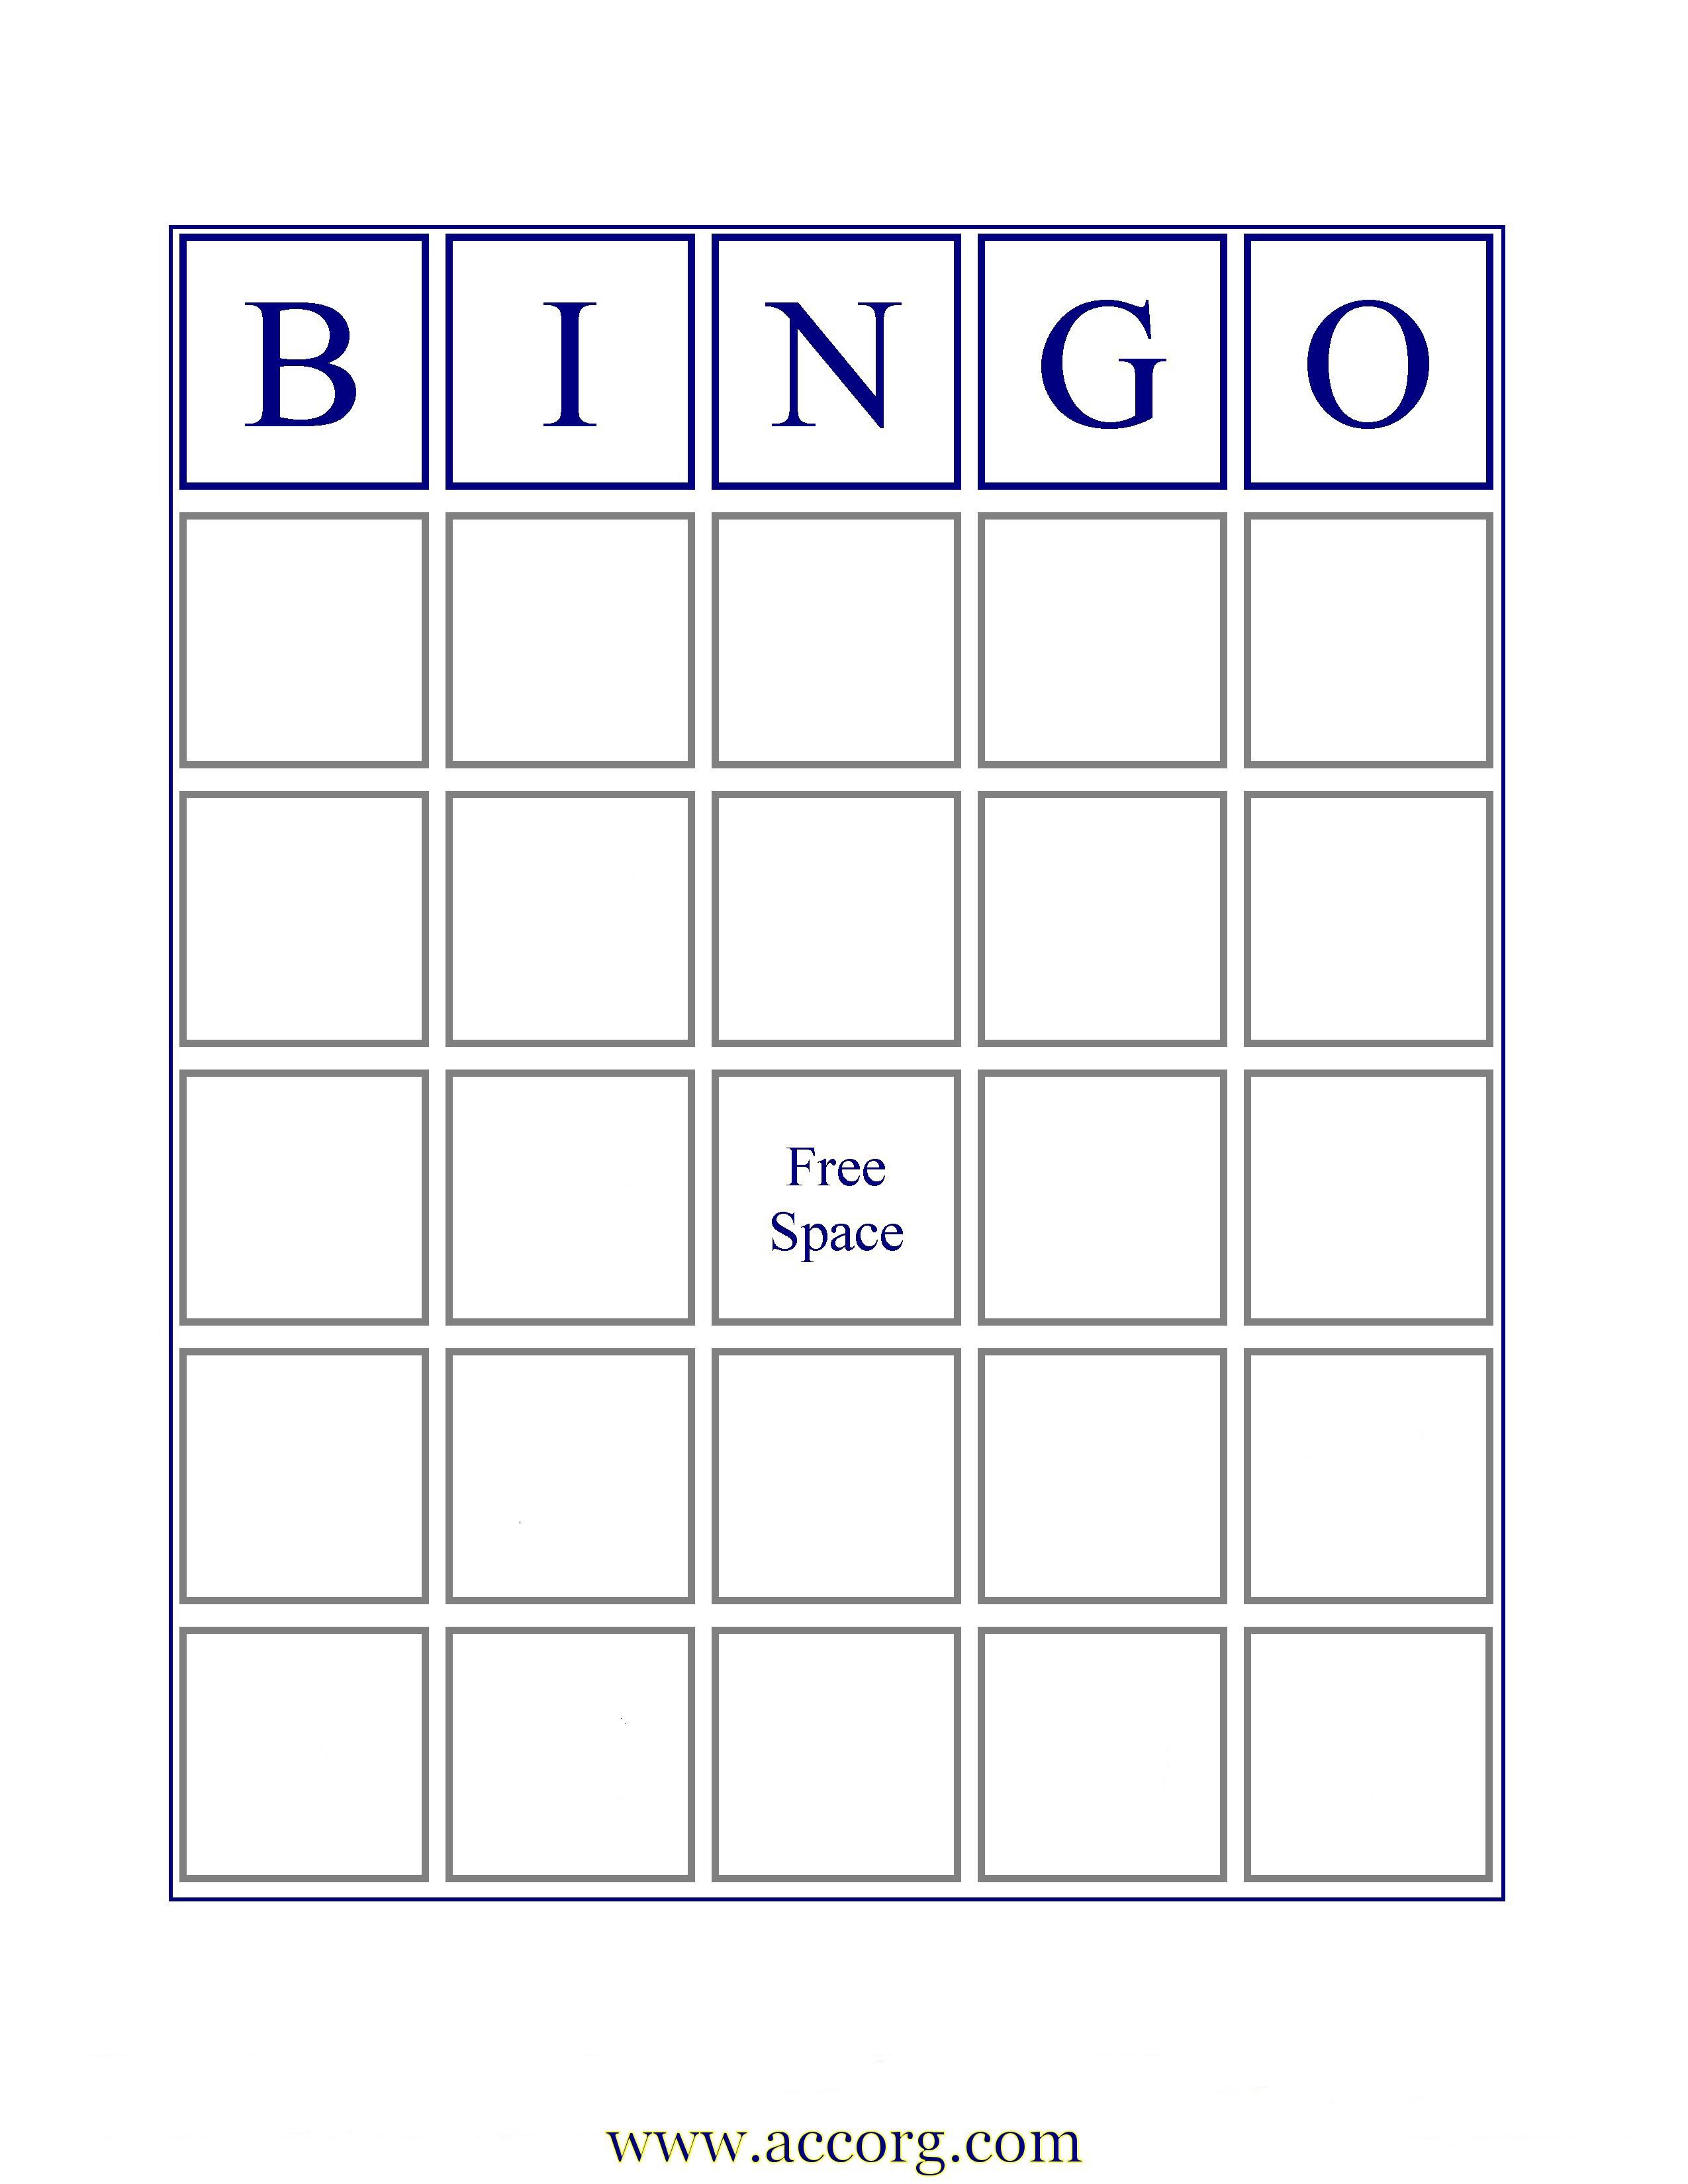 Blank Bingo Template Word – Thefreedl - Free Printable Blank Bingo Cards